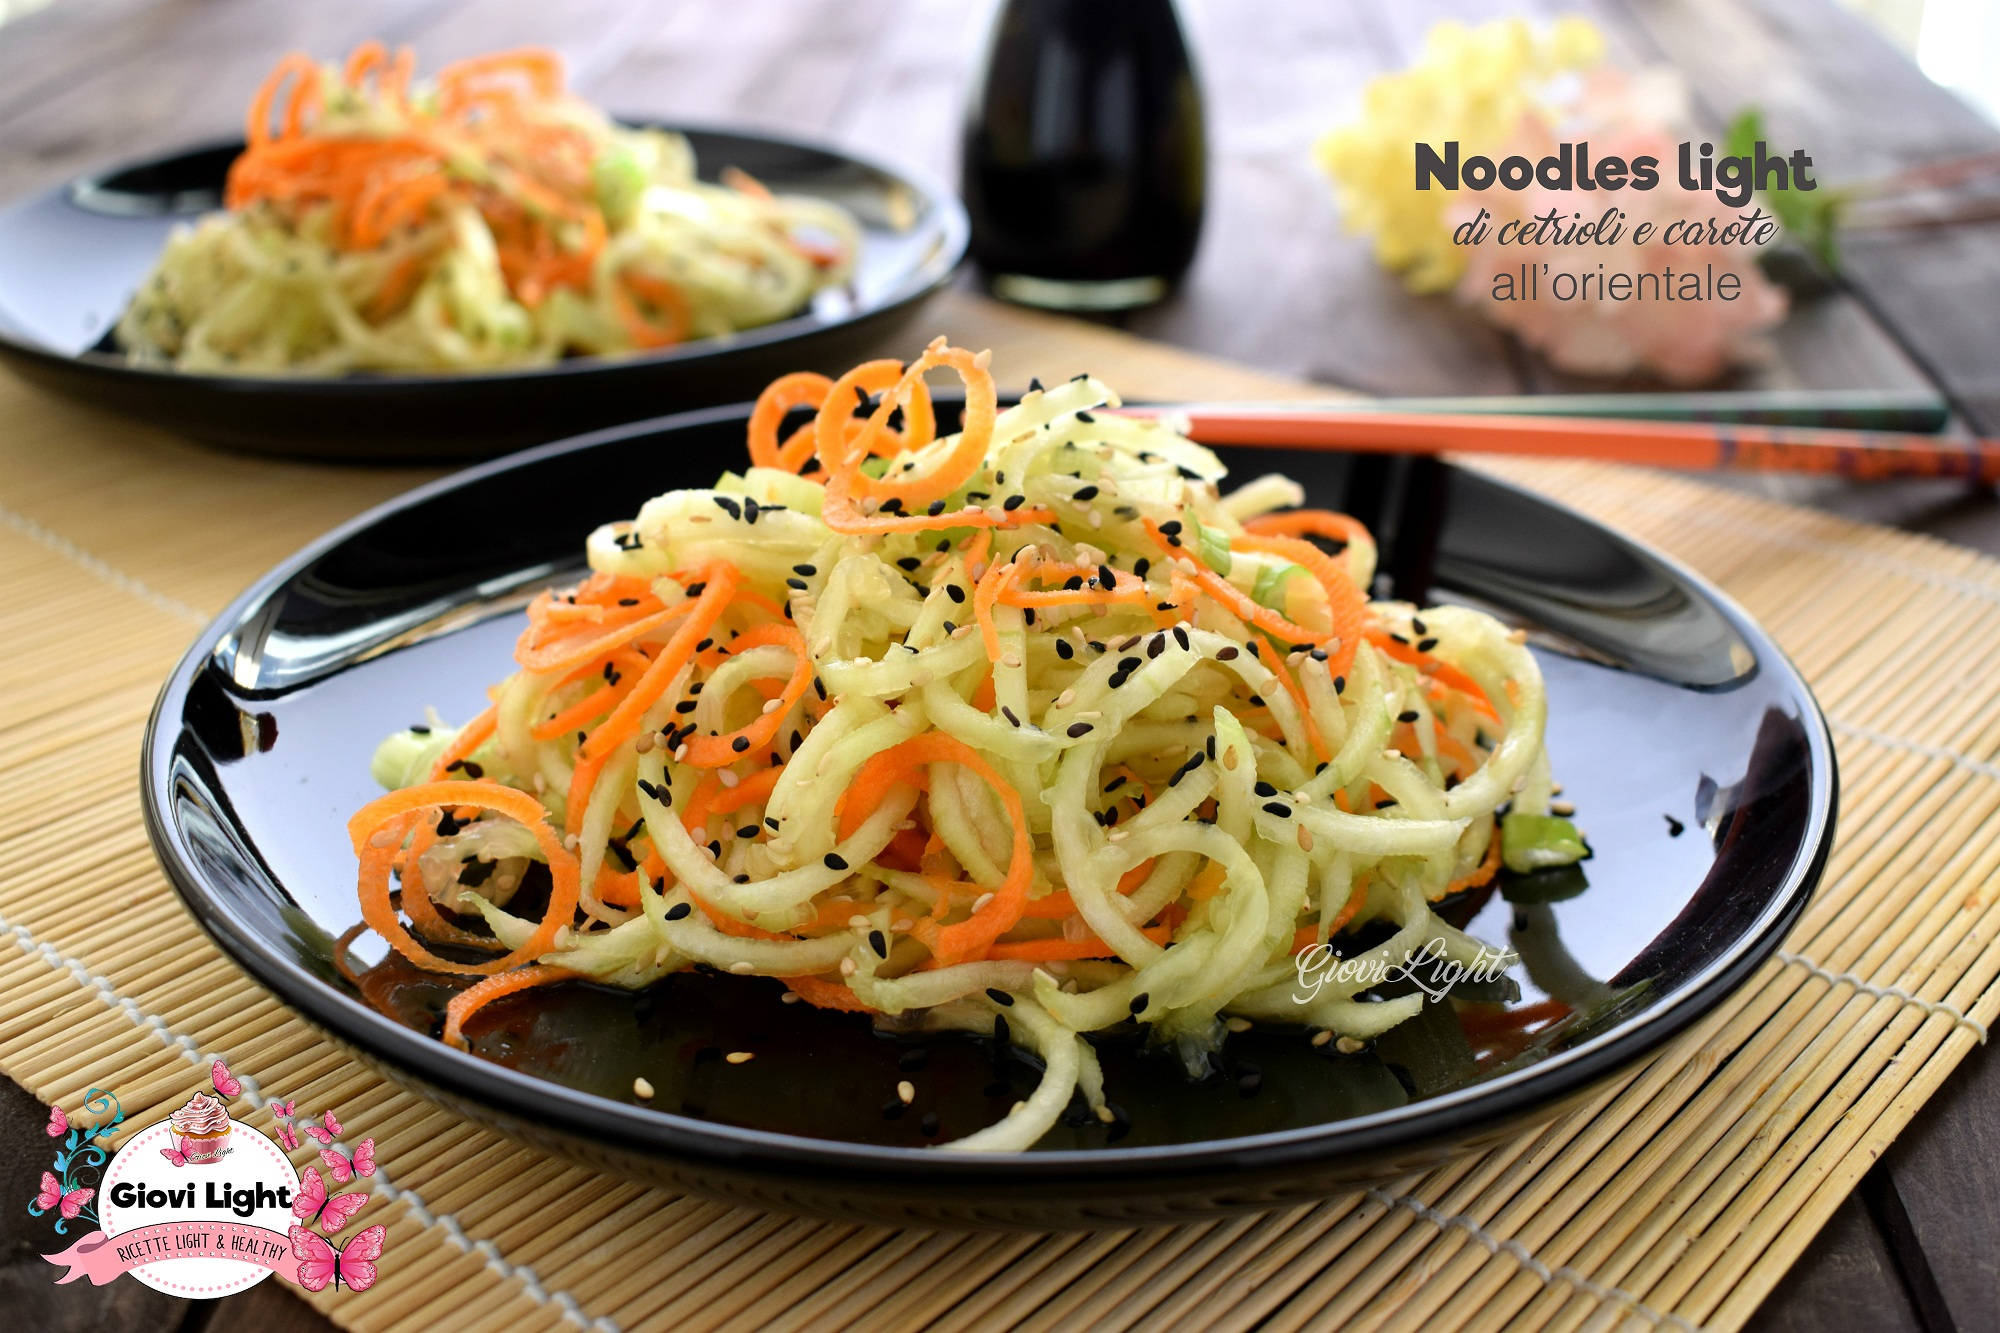 Noodles light di cetrioli e carote all\u0027orientale